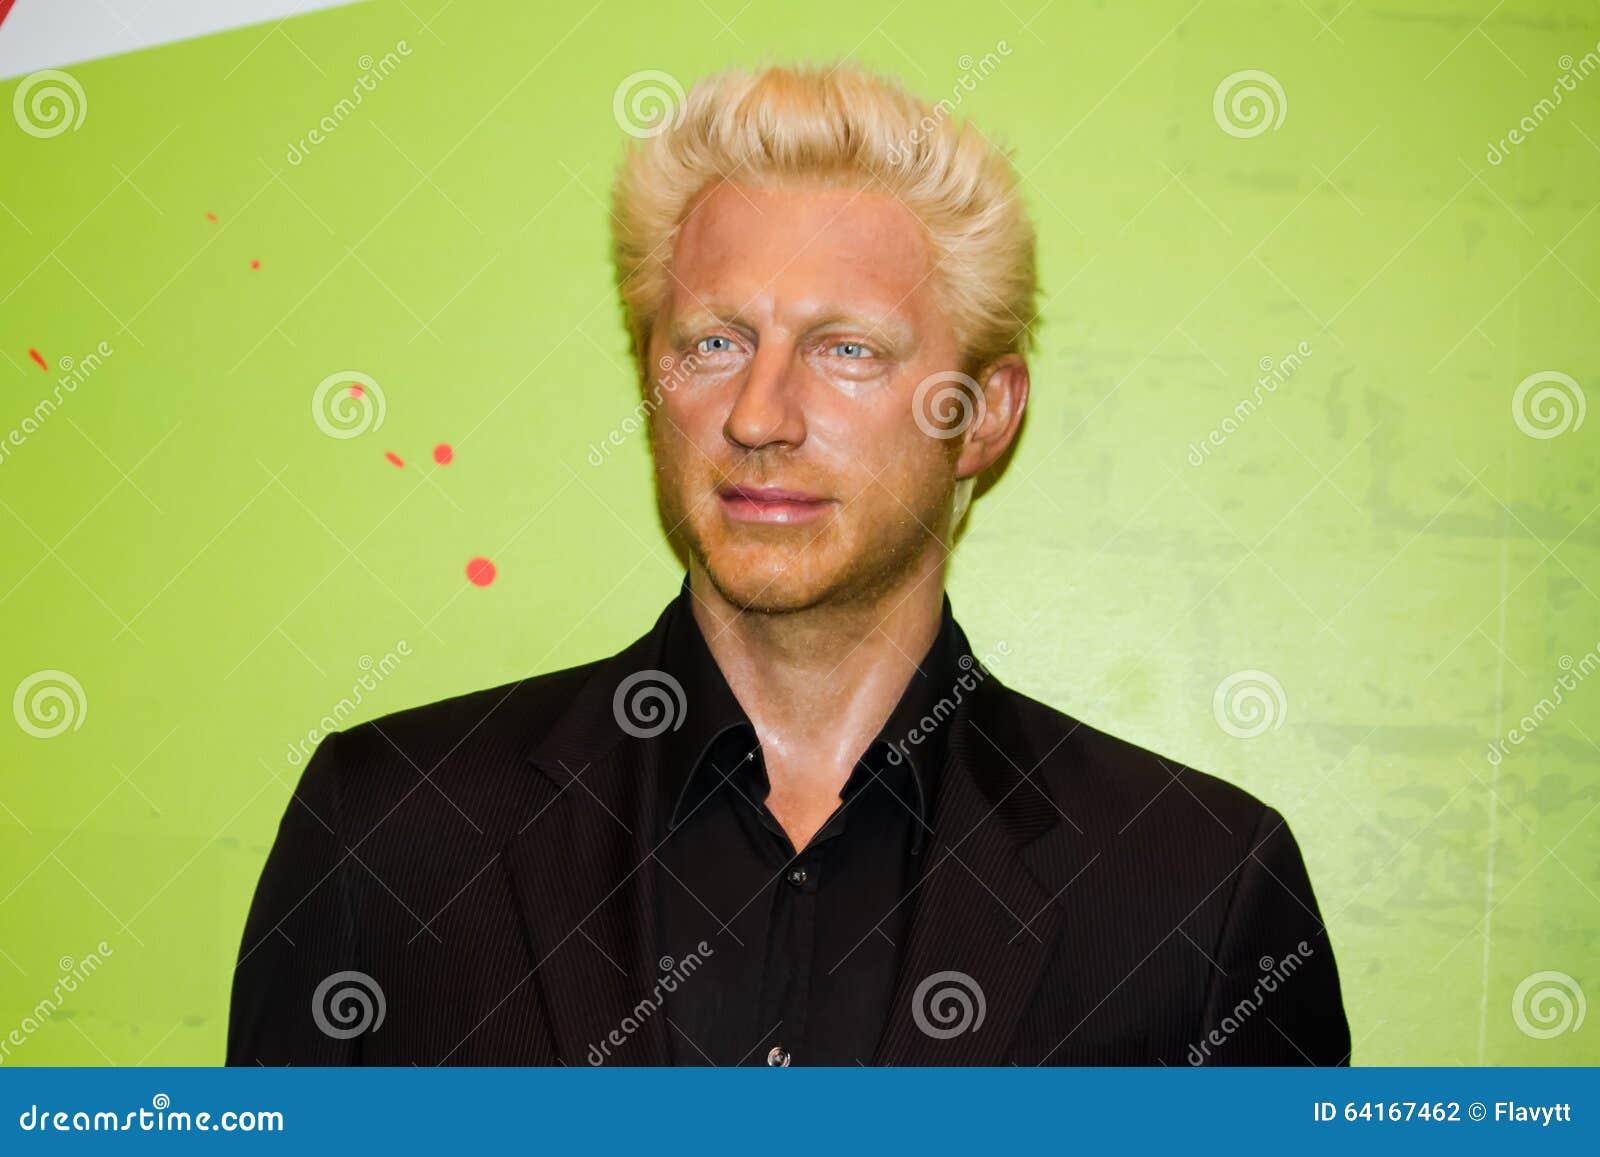 Boris becker editorial photography image 64167462 for Becker payment plan